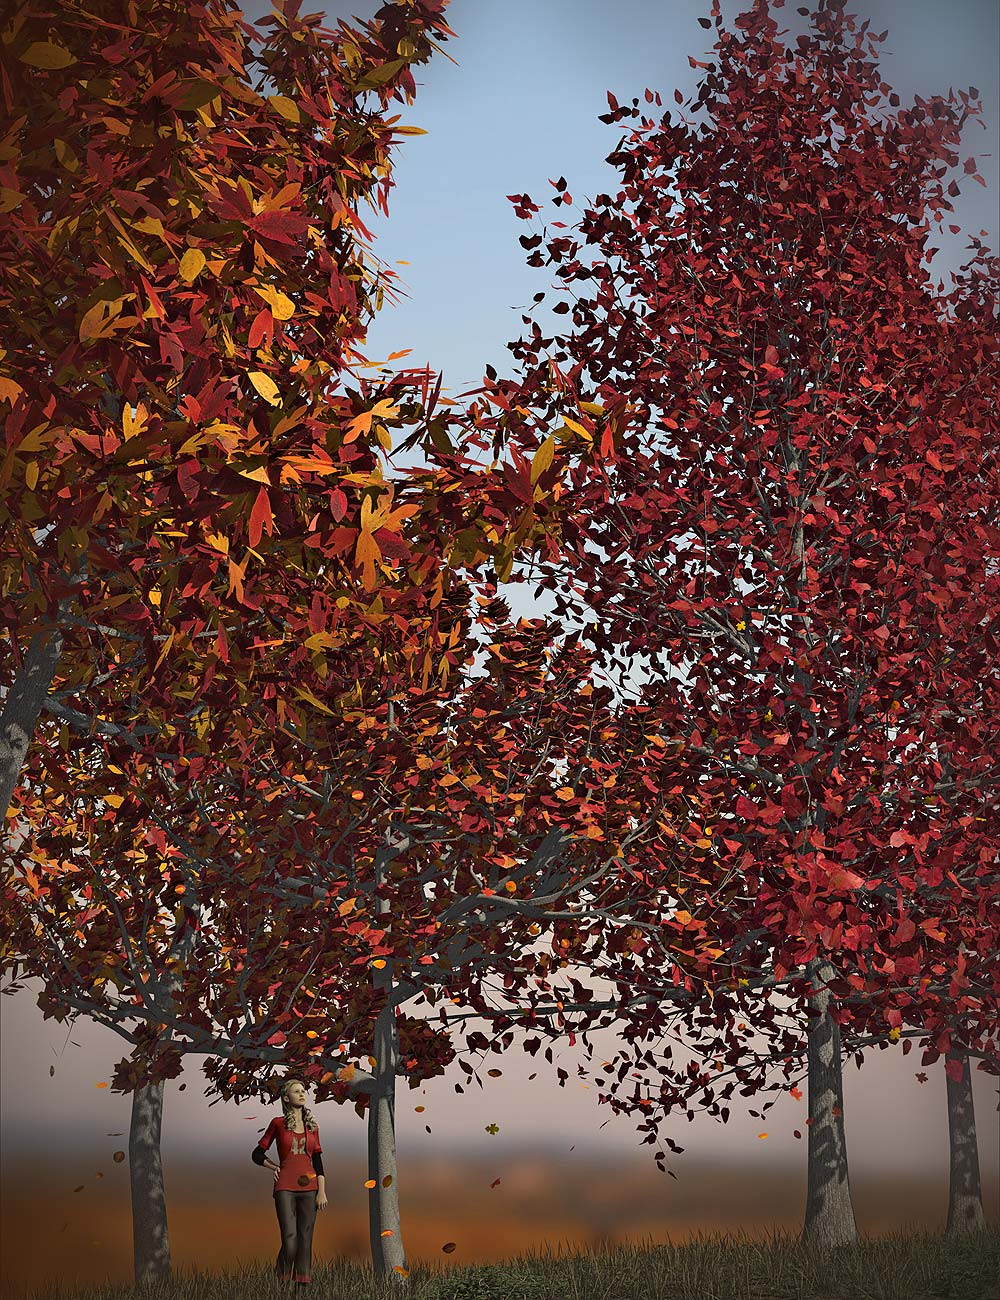 Orestes Trees Vol 2 by: Orestes Graphics, 3D Models by Daz 3D